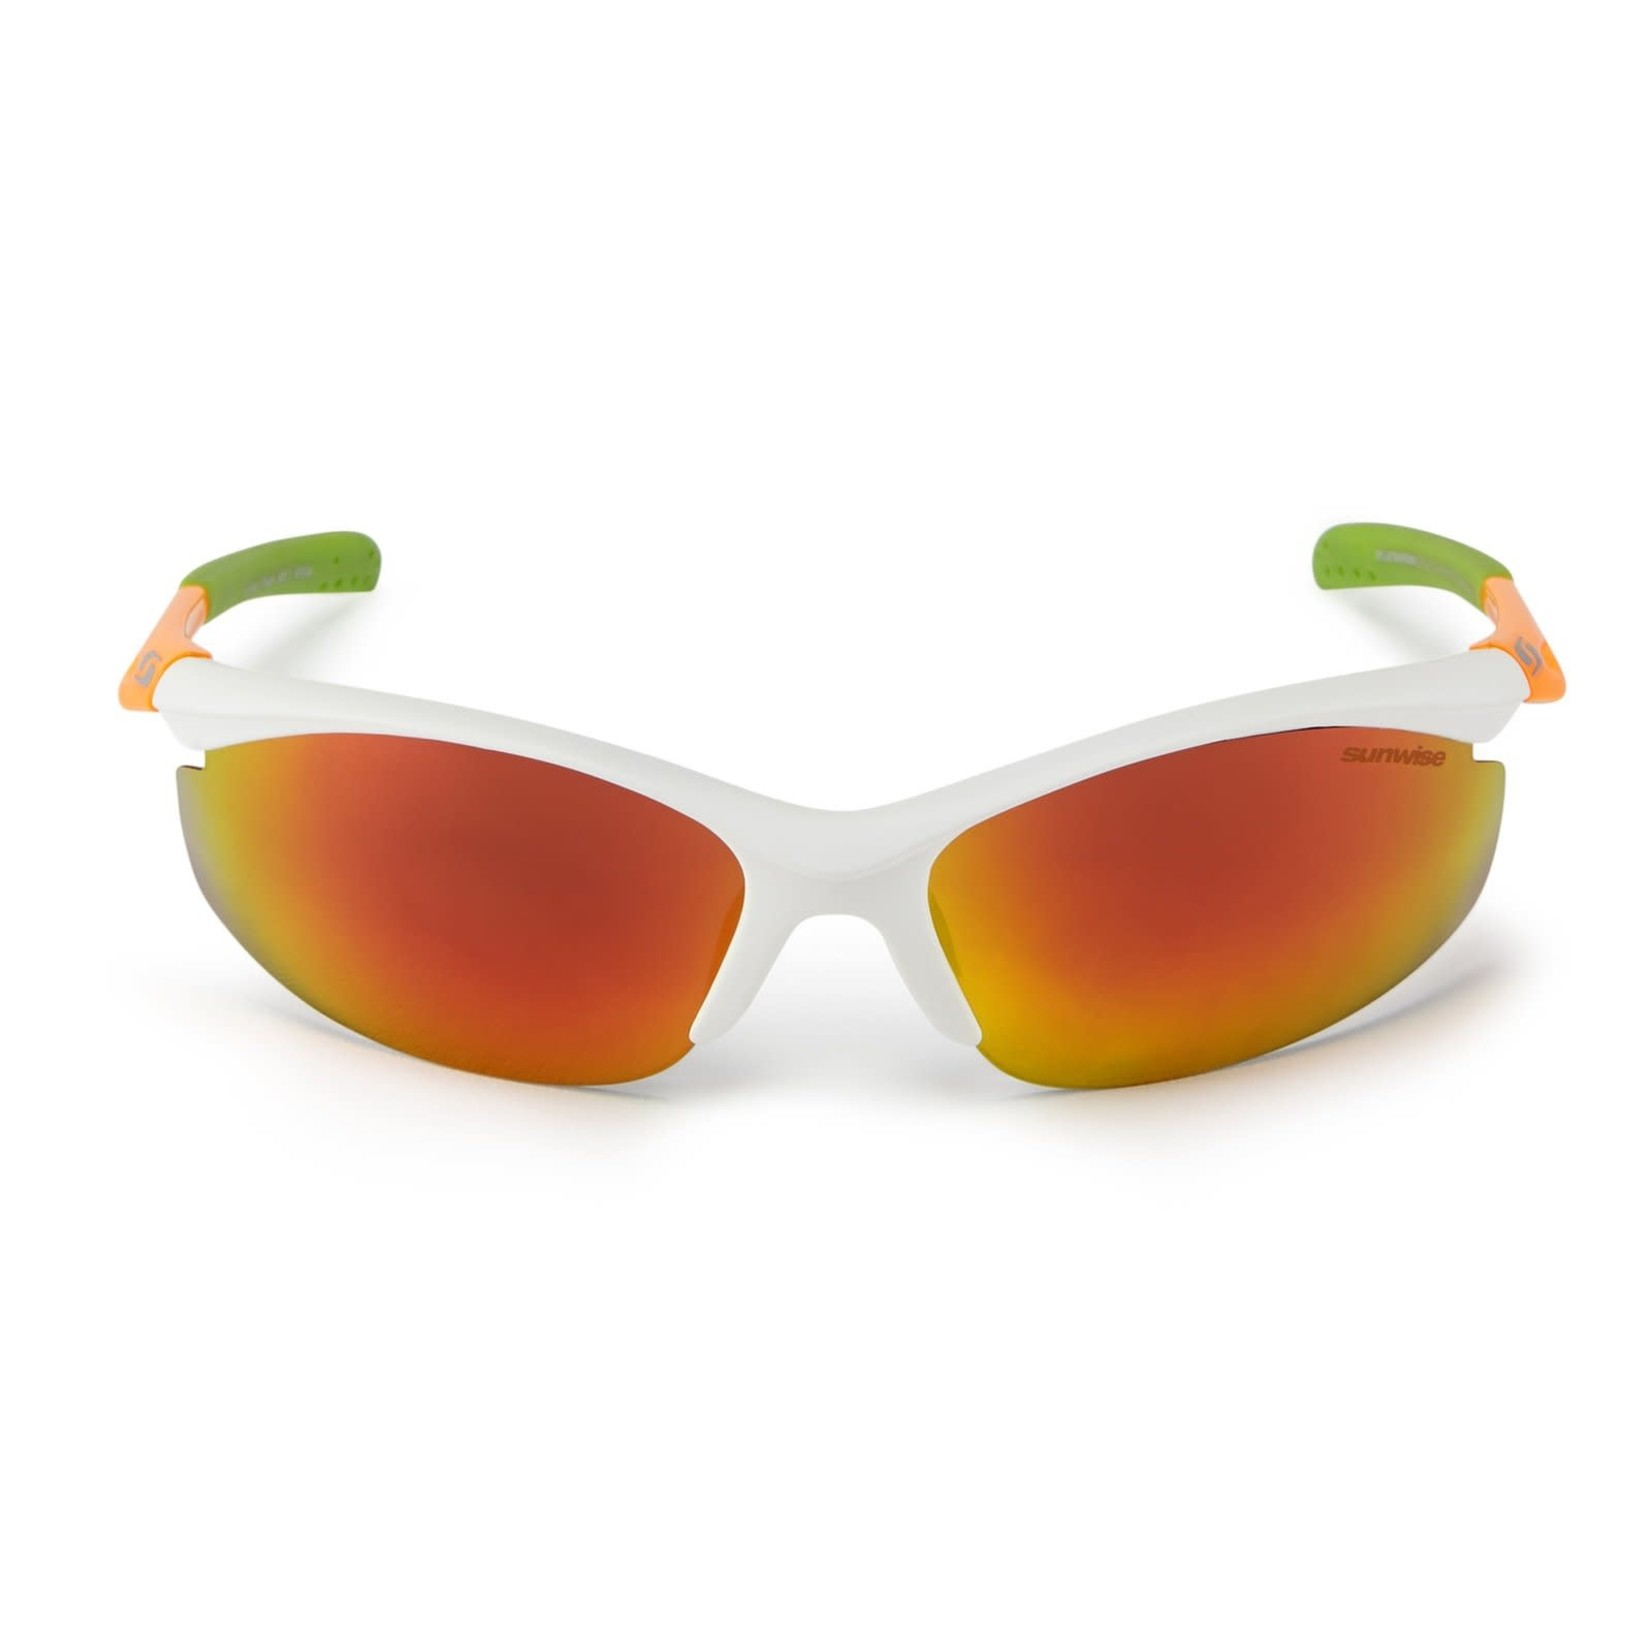 Sunwise Peak MK1 Sunglasses White